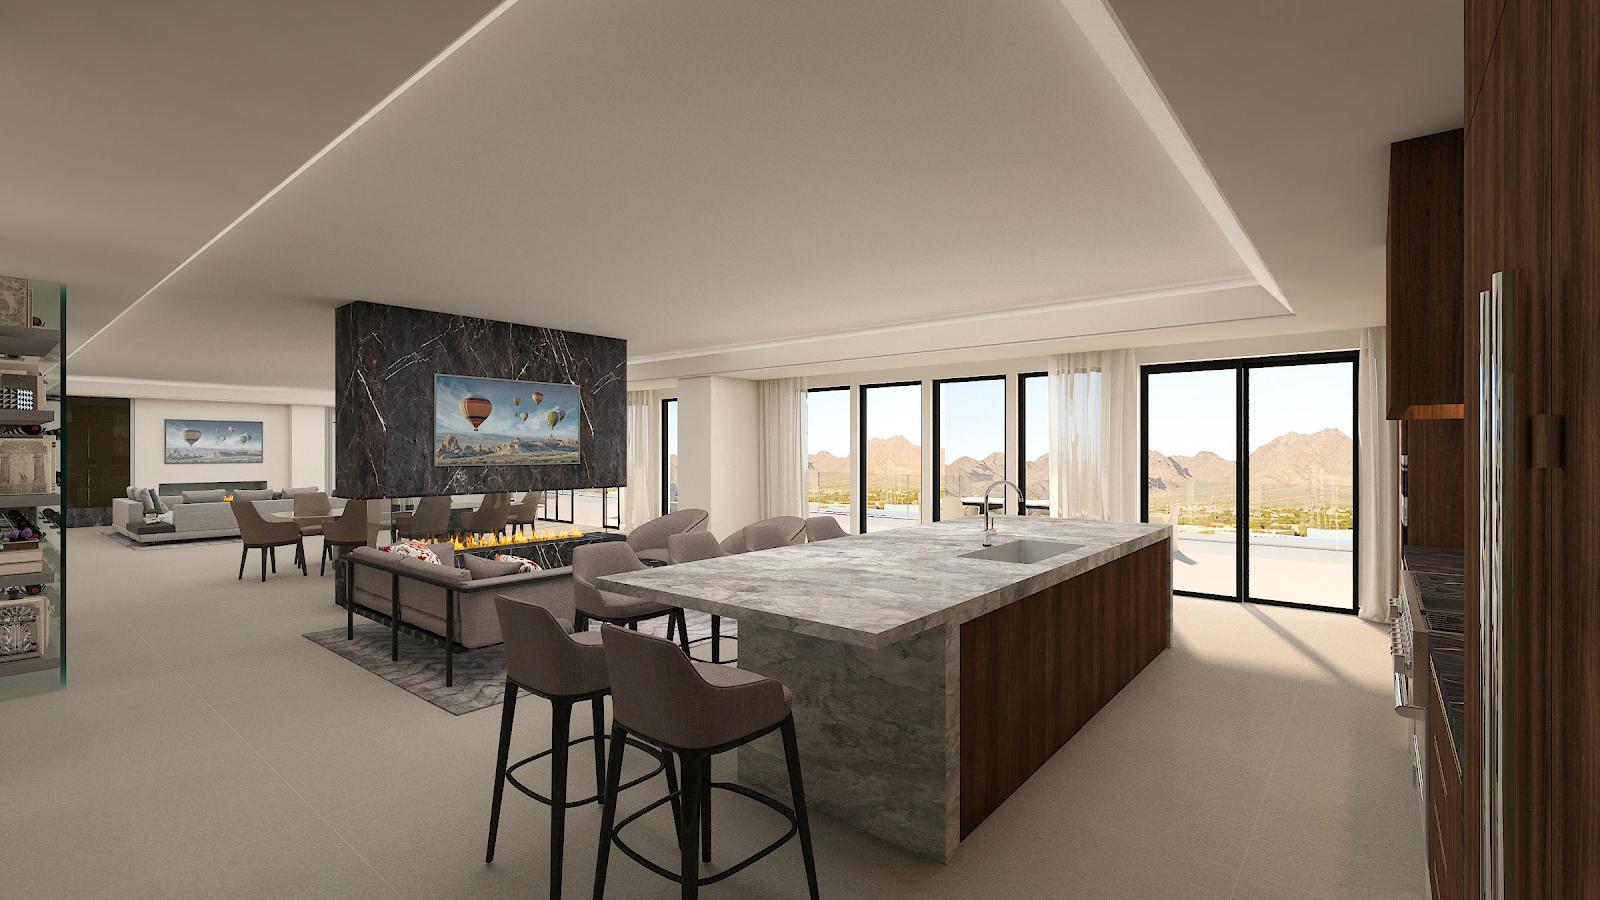 Irene Catsibris Clary on SOHO Scottsdale's Latest Luxury Townhomes, Penthouses & Lofts01